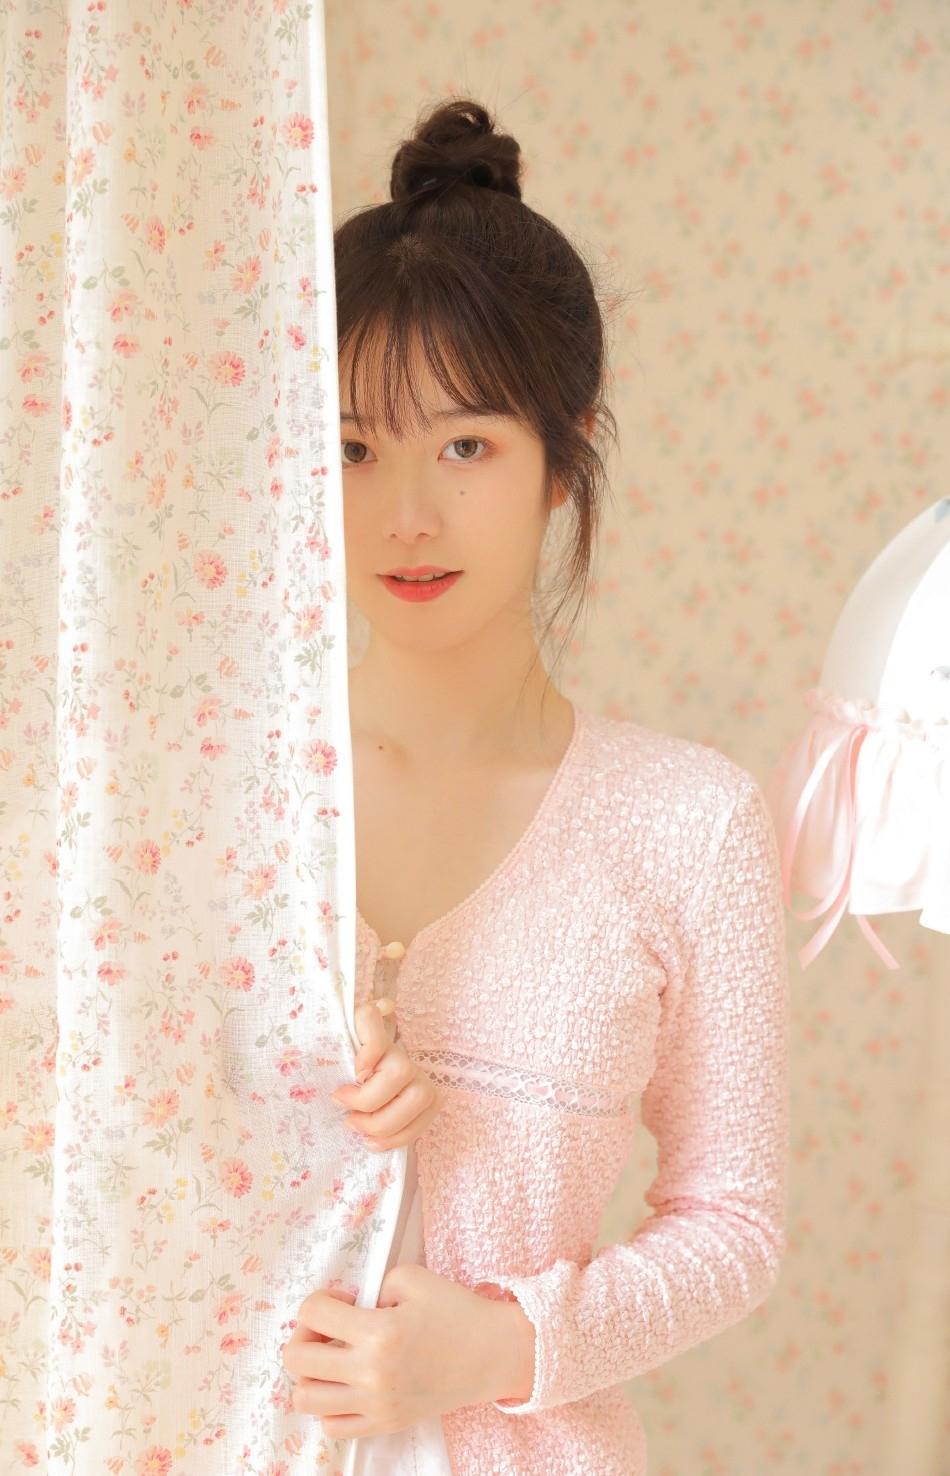 ATFB-177雪白美胸美女内衣性感写真